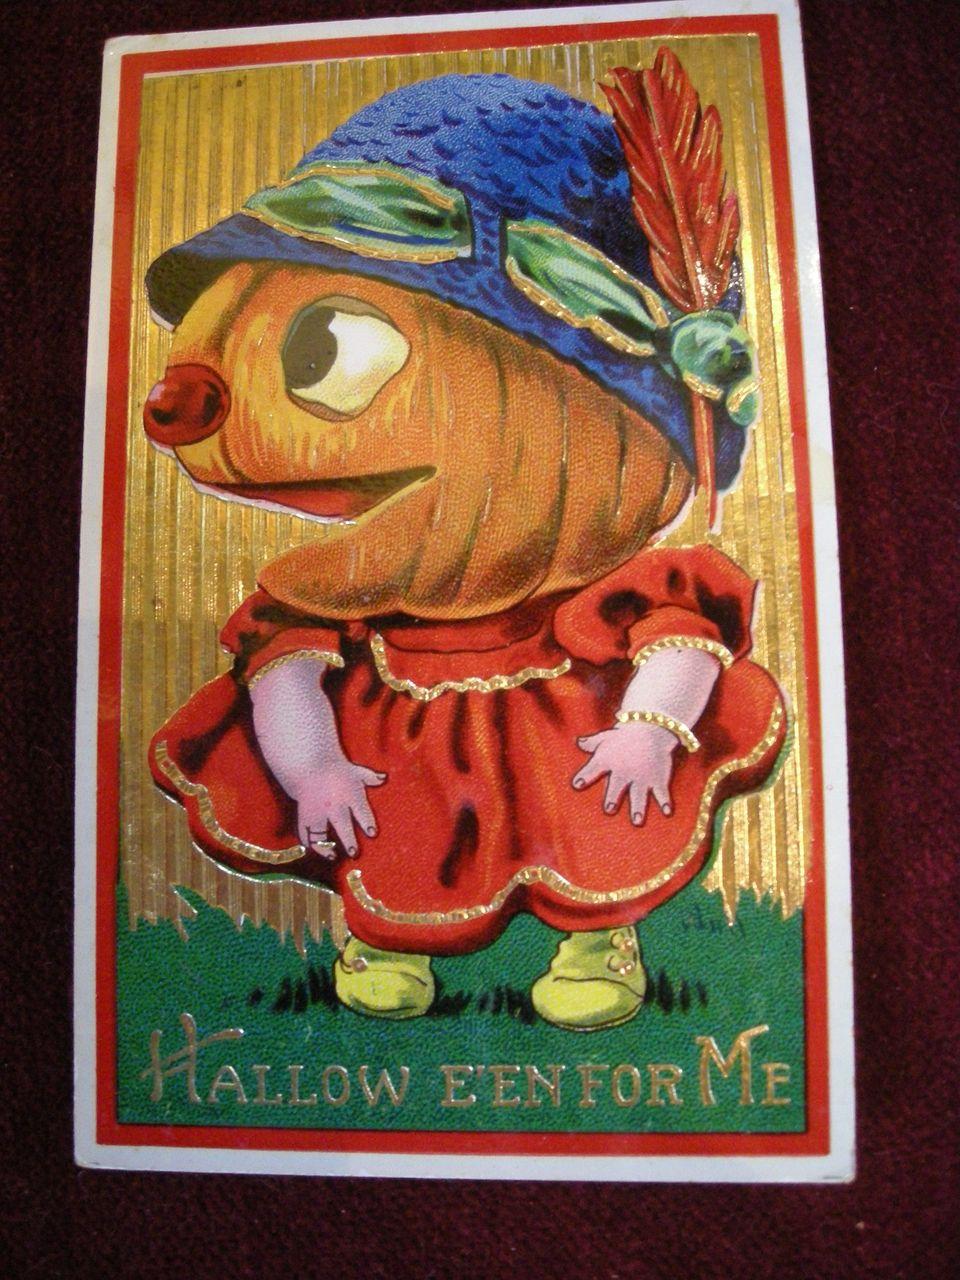 Halloween Postcard with Giant Pumpkin Head